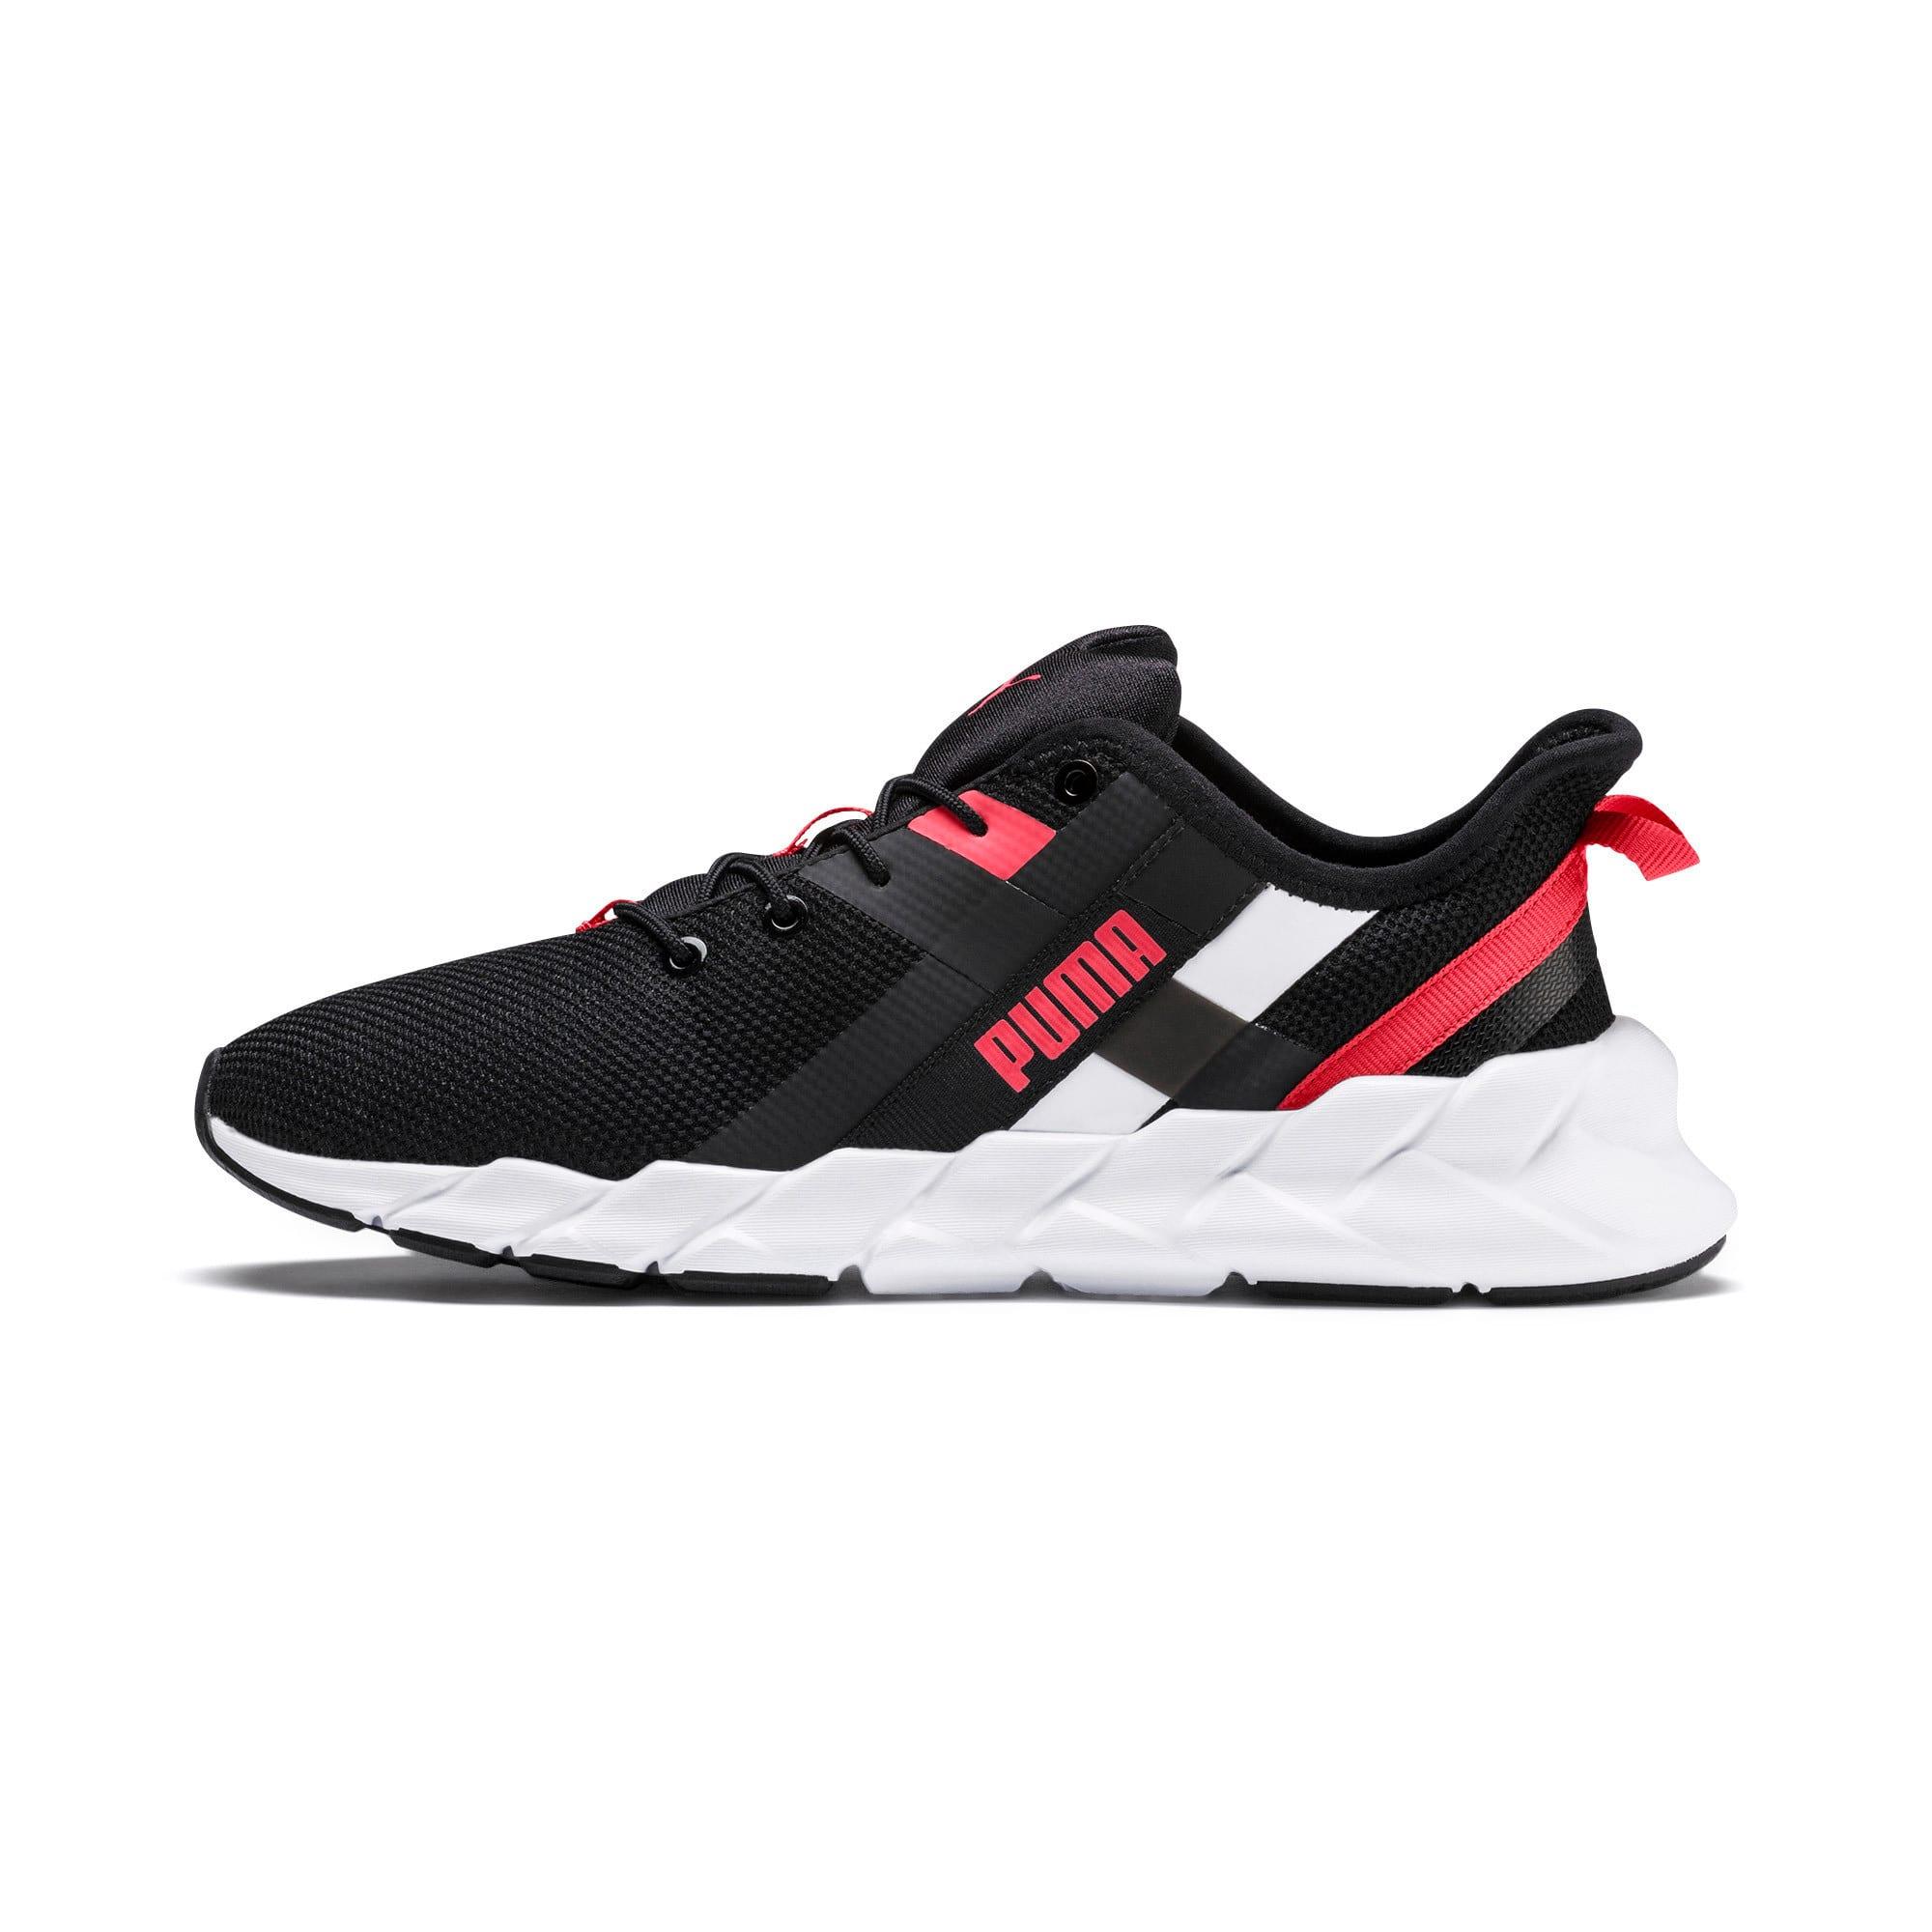 Thumbnail 1 of Weave XT Training Shoes JR, Black-White-Calypso Coral, medium